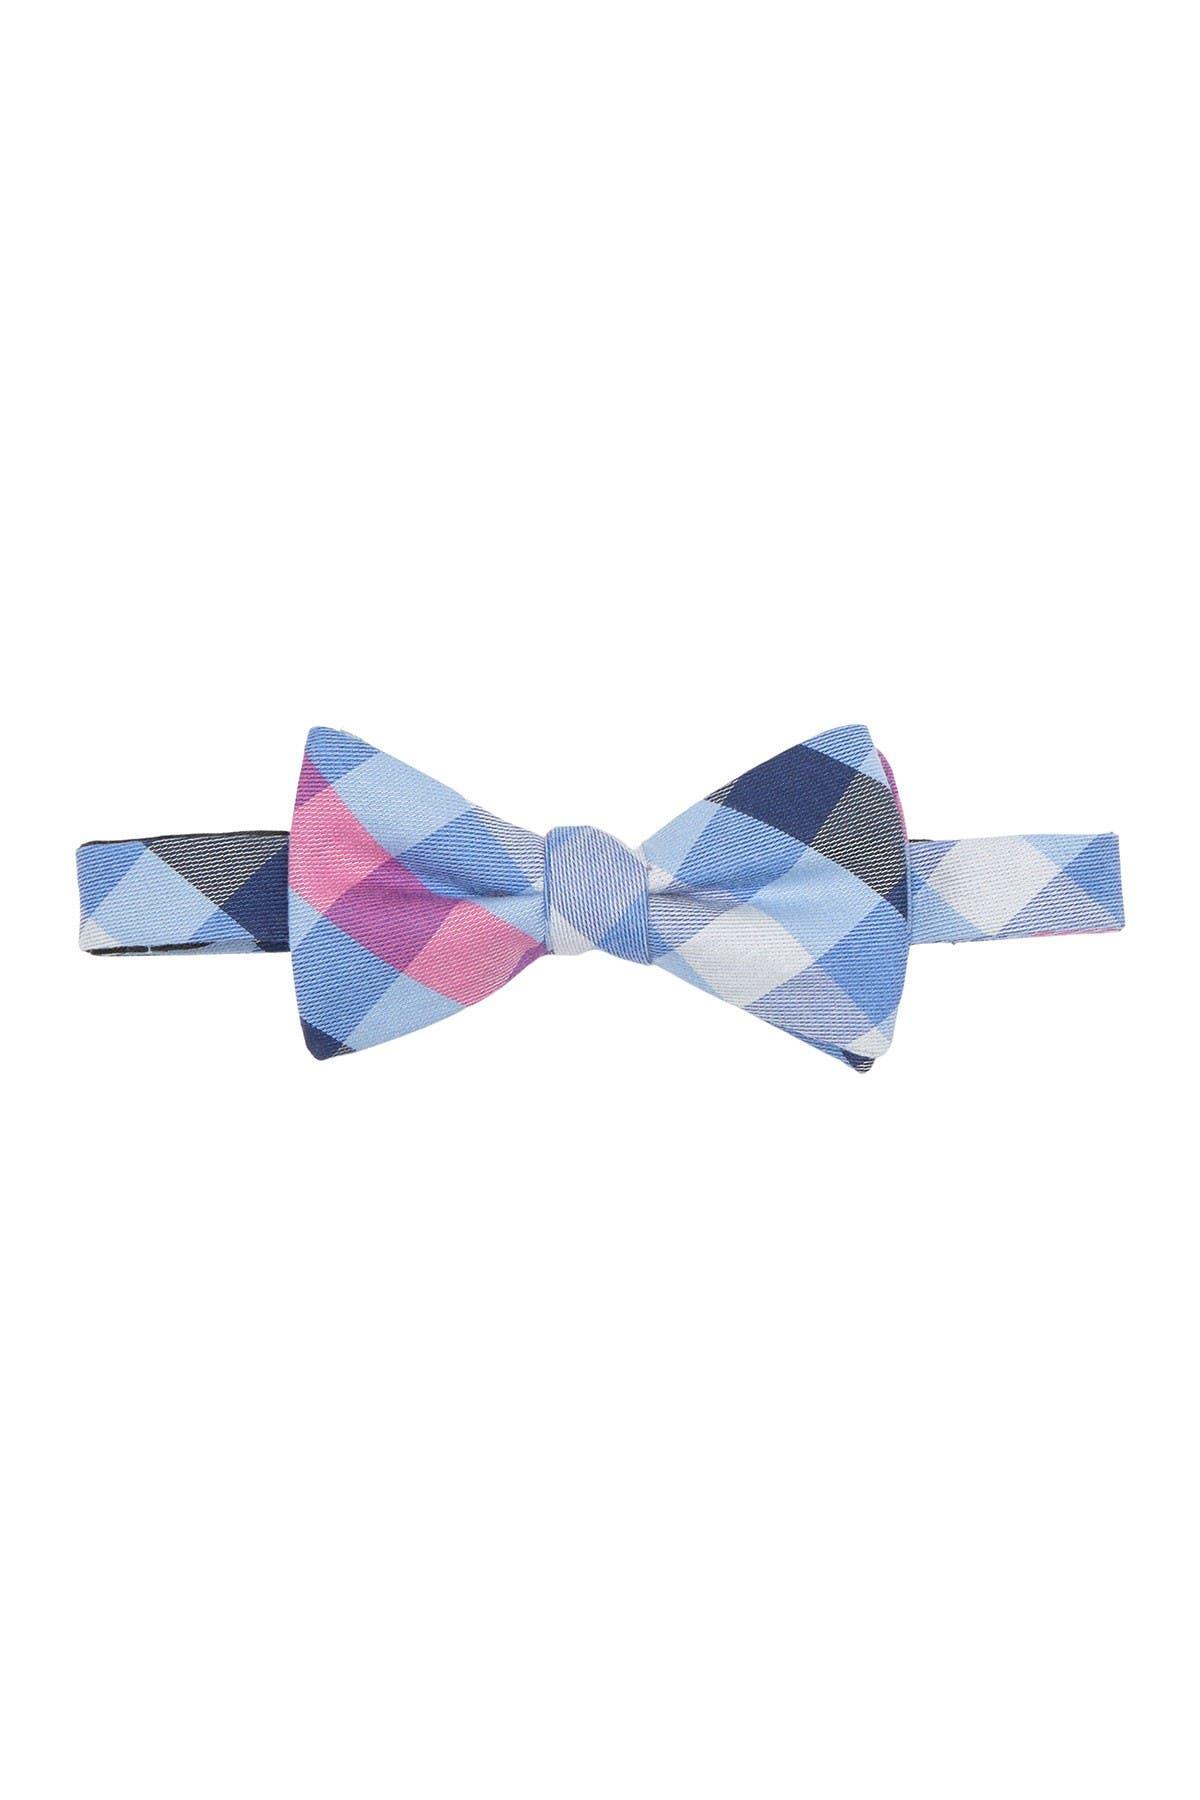 Image of Tommy Hilfiger Preppy Plaid Print Bow Tie